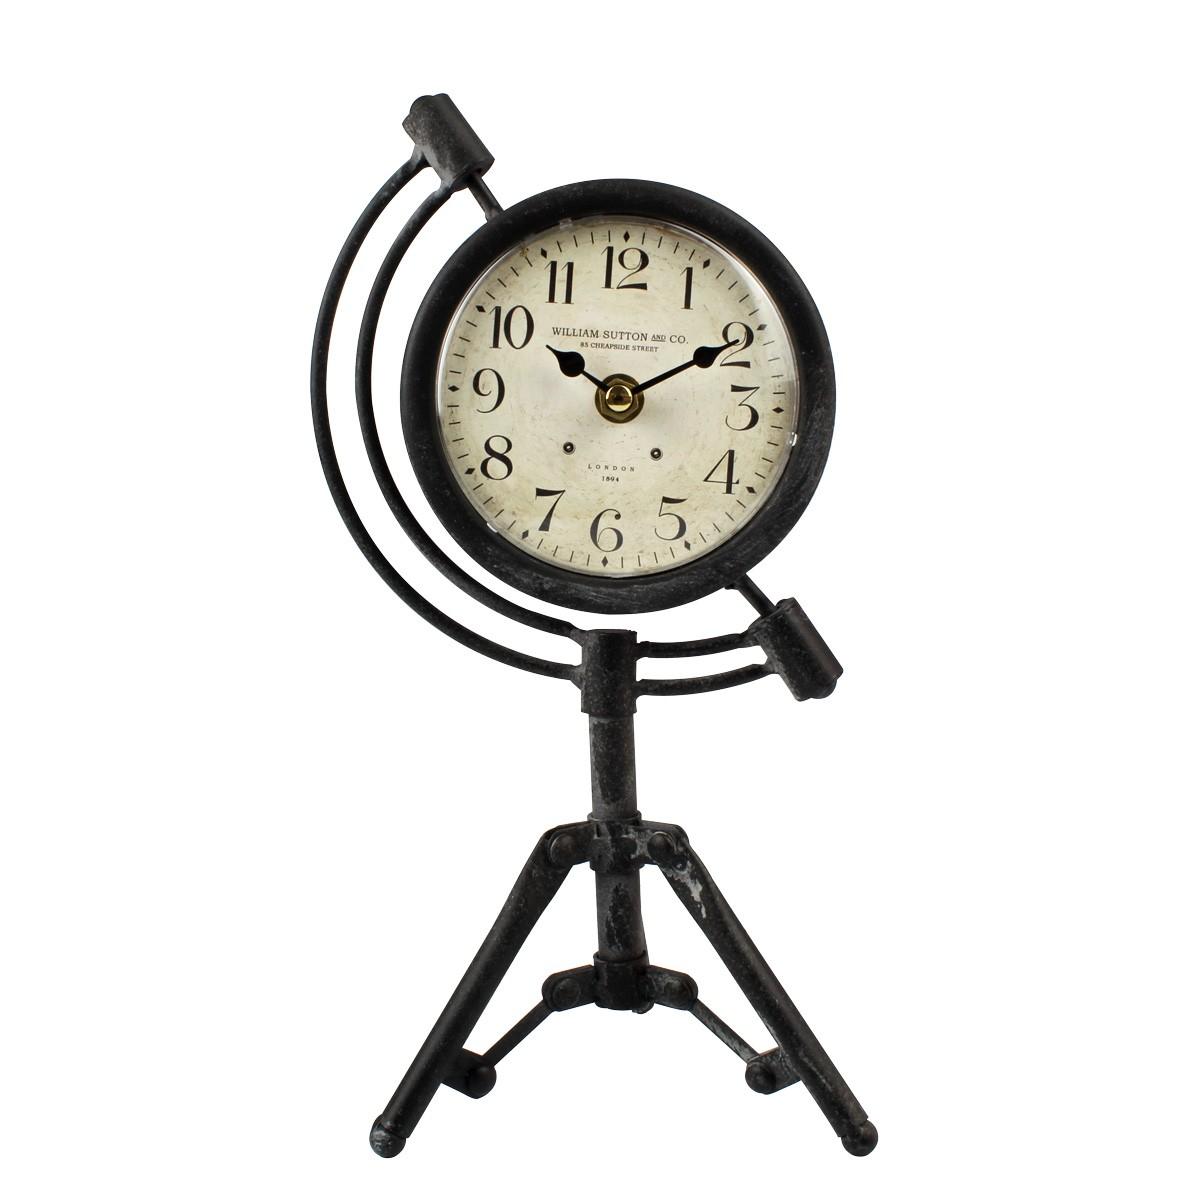 Relógio De Mesa Tripé Retrô William Sutton And CO. London 1894